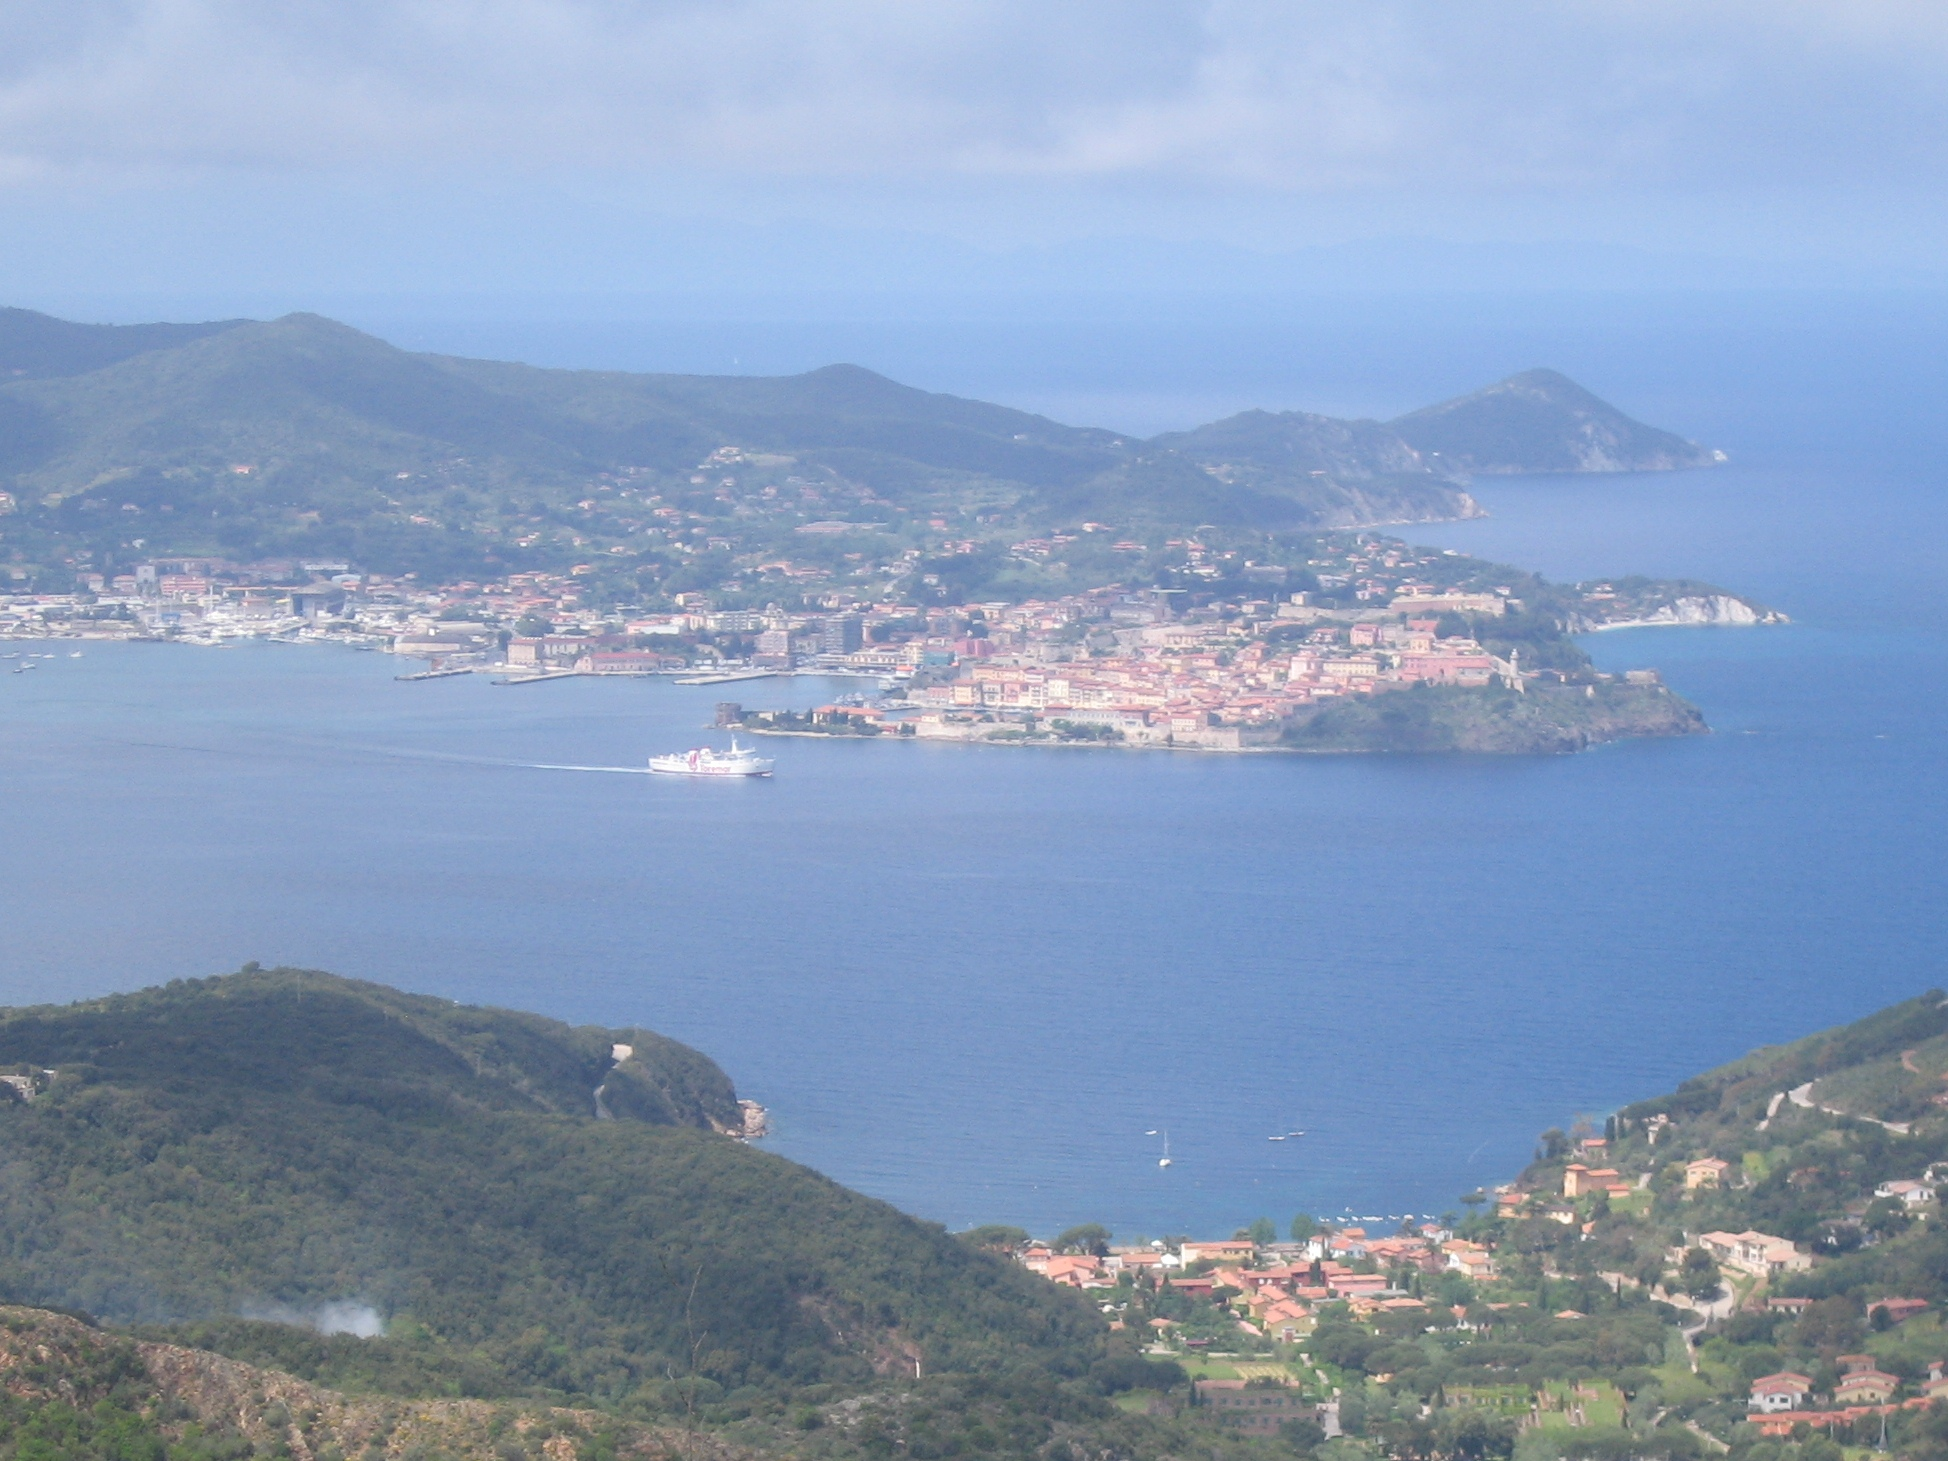 Portoferraio from the East